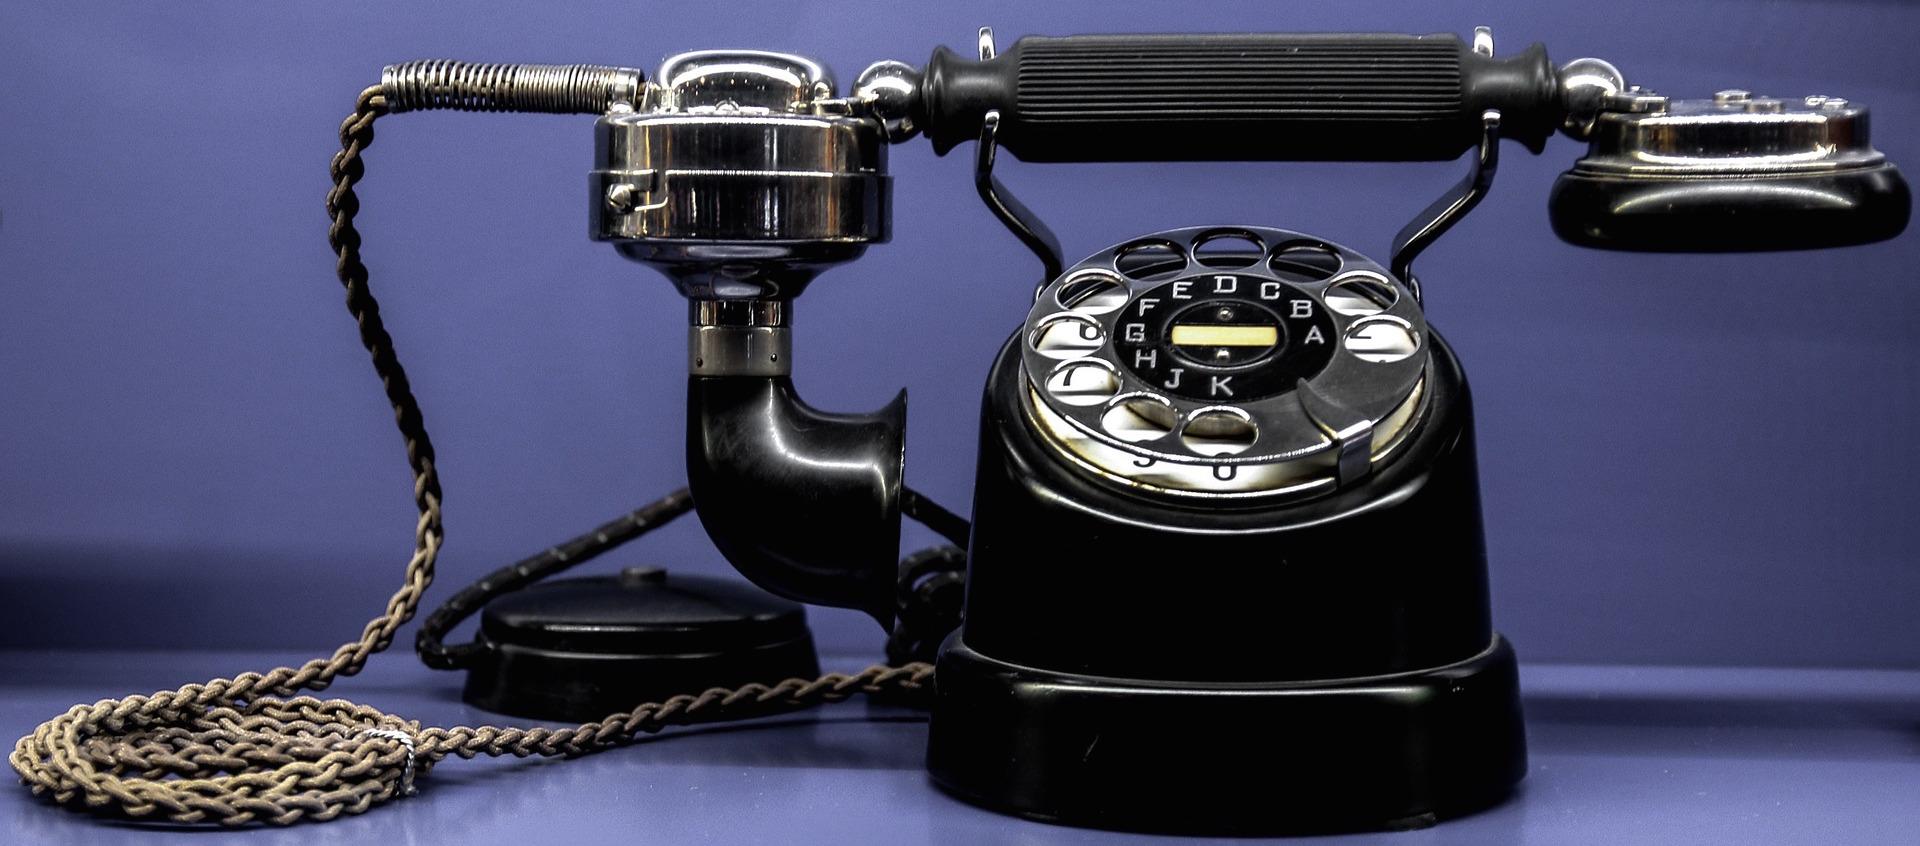 CATMEDIA Marketing and Advertising Rotary Phone